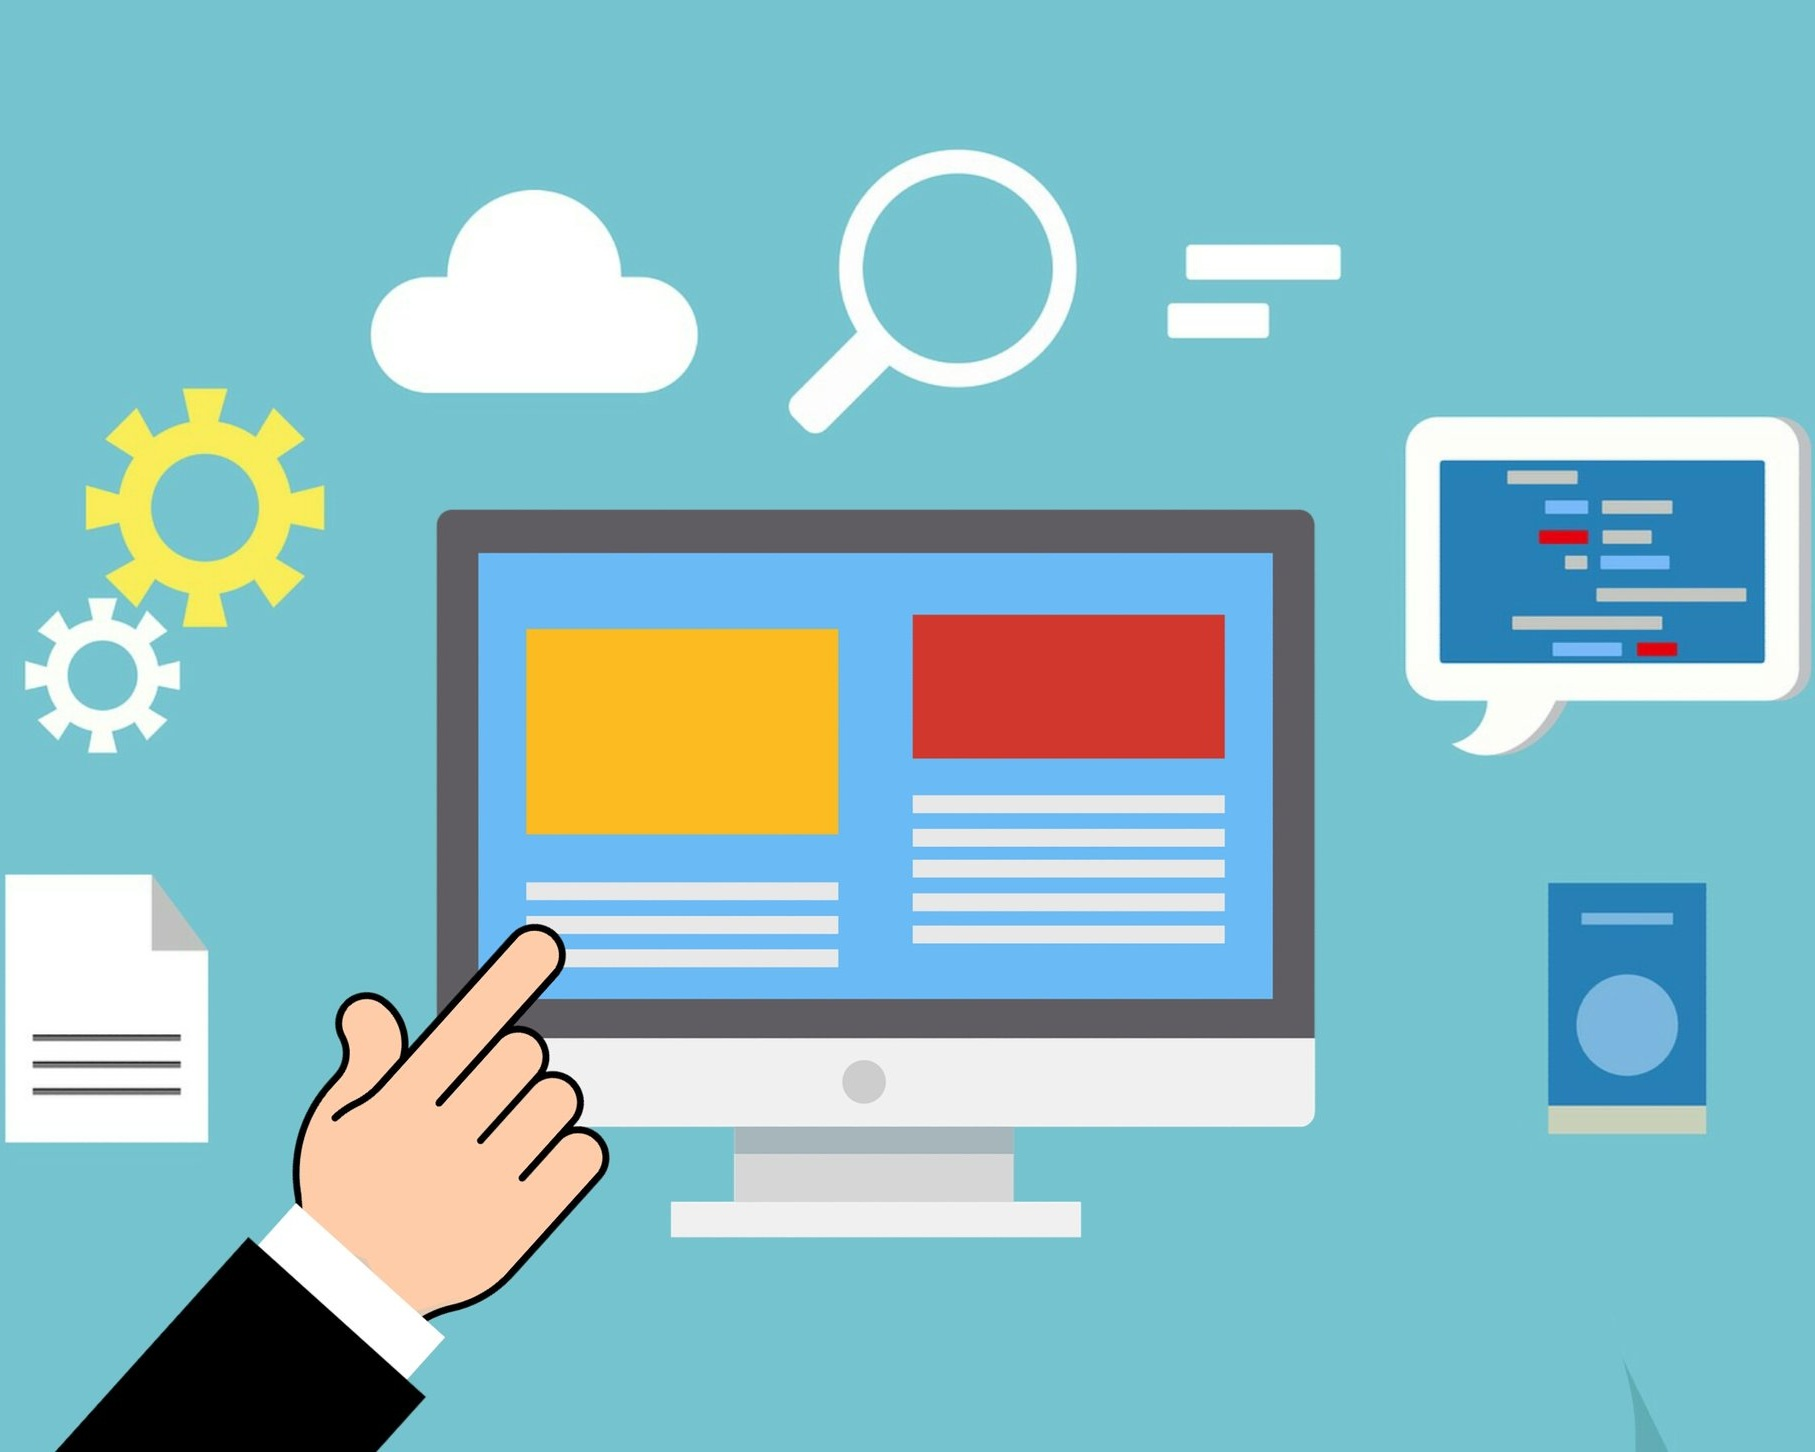 web-domain-service-website-development-seo-1571969-pxhere.com.jpg